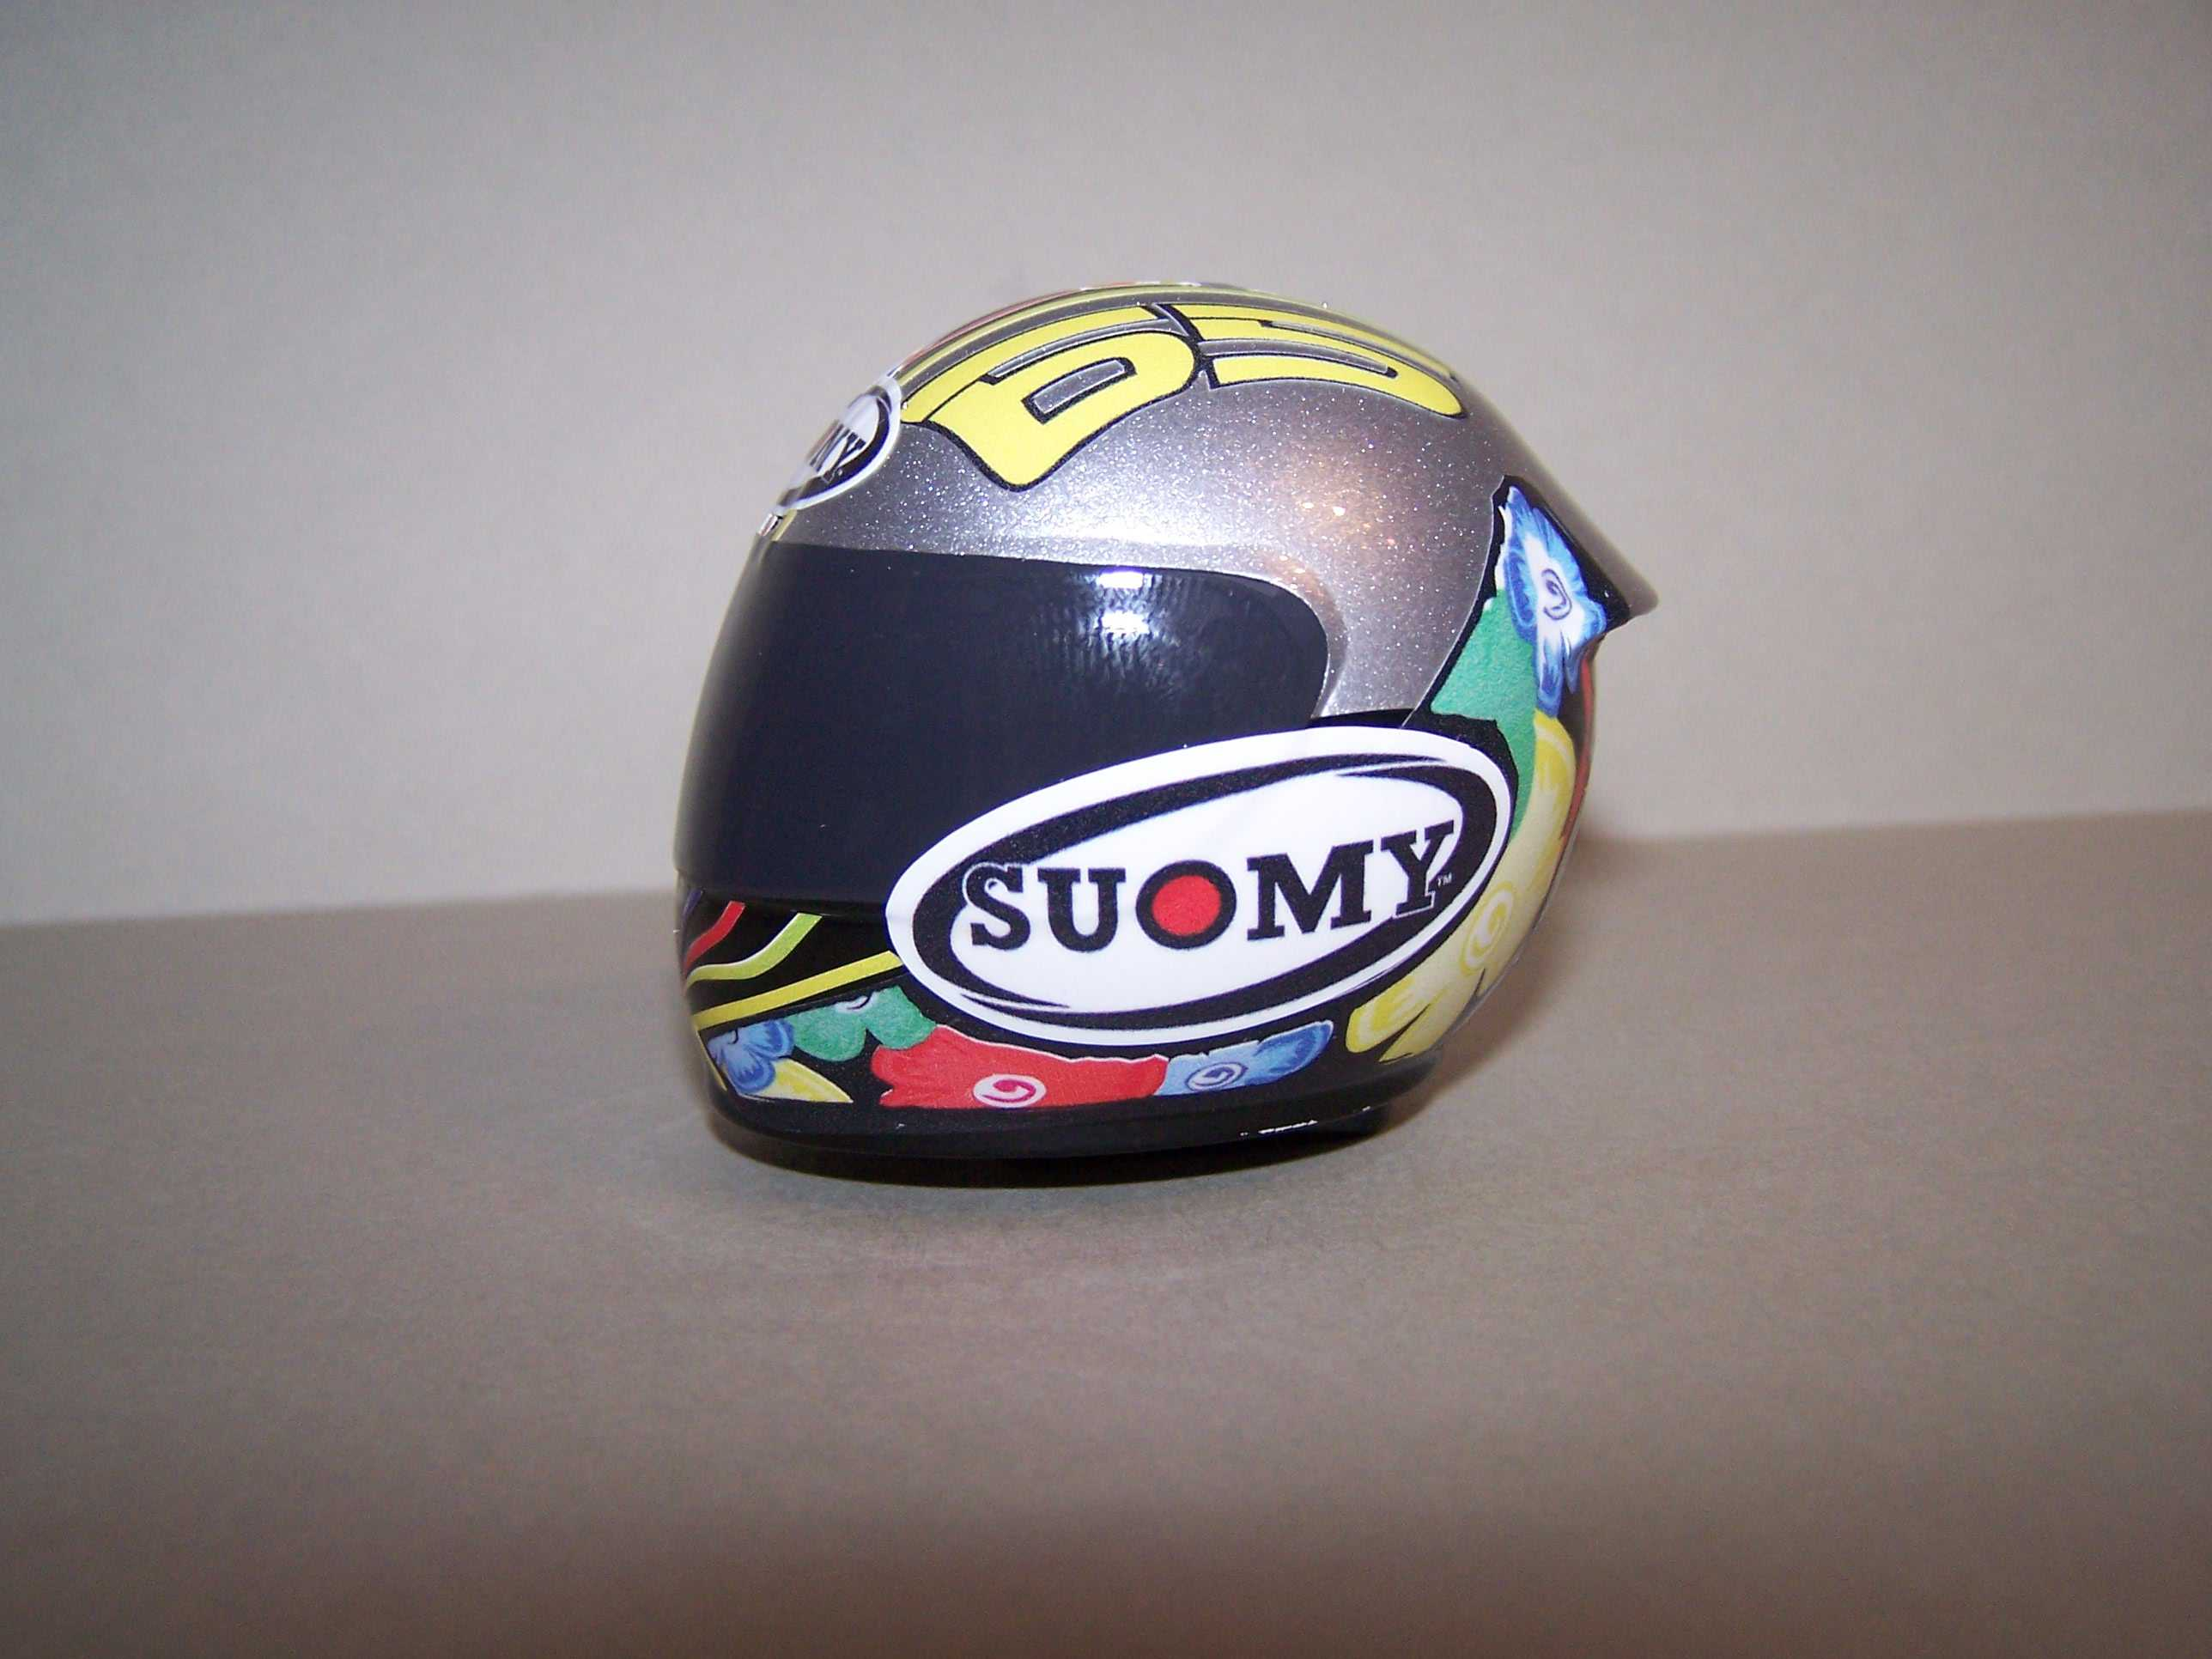 [Helm-Capirossi-Pramac-Ducati-2.jpg]